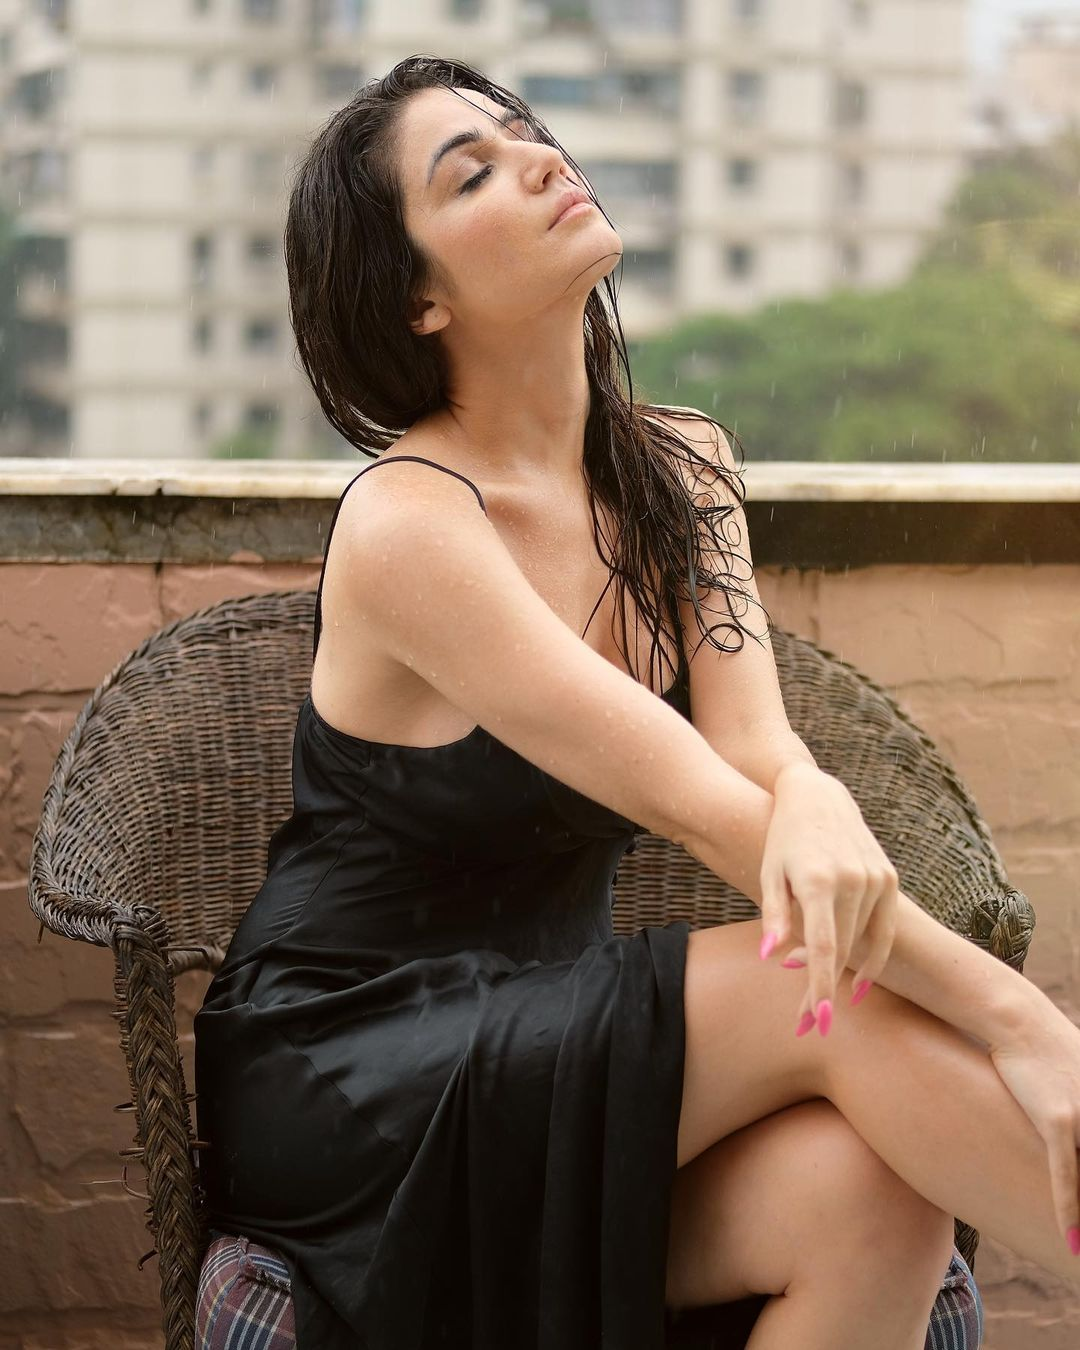 Beautiful model in rain whatsapp dp